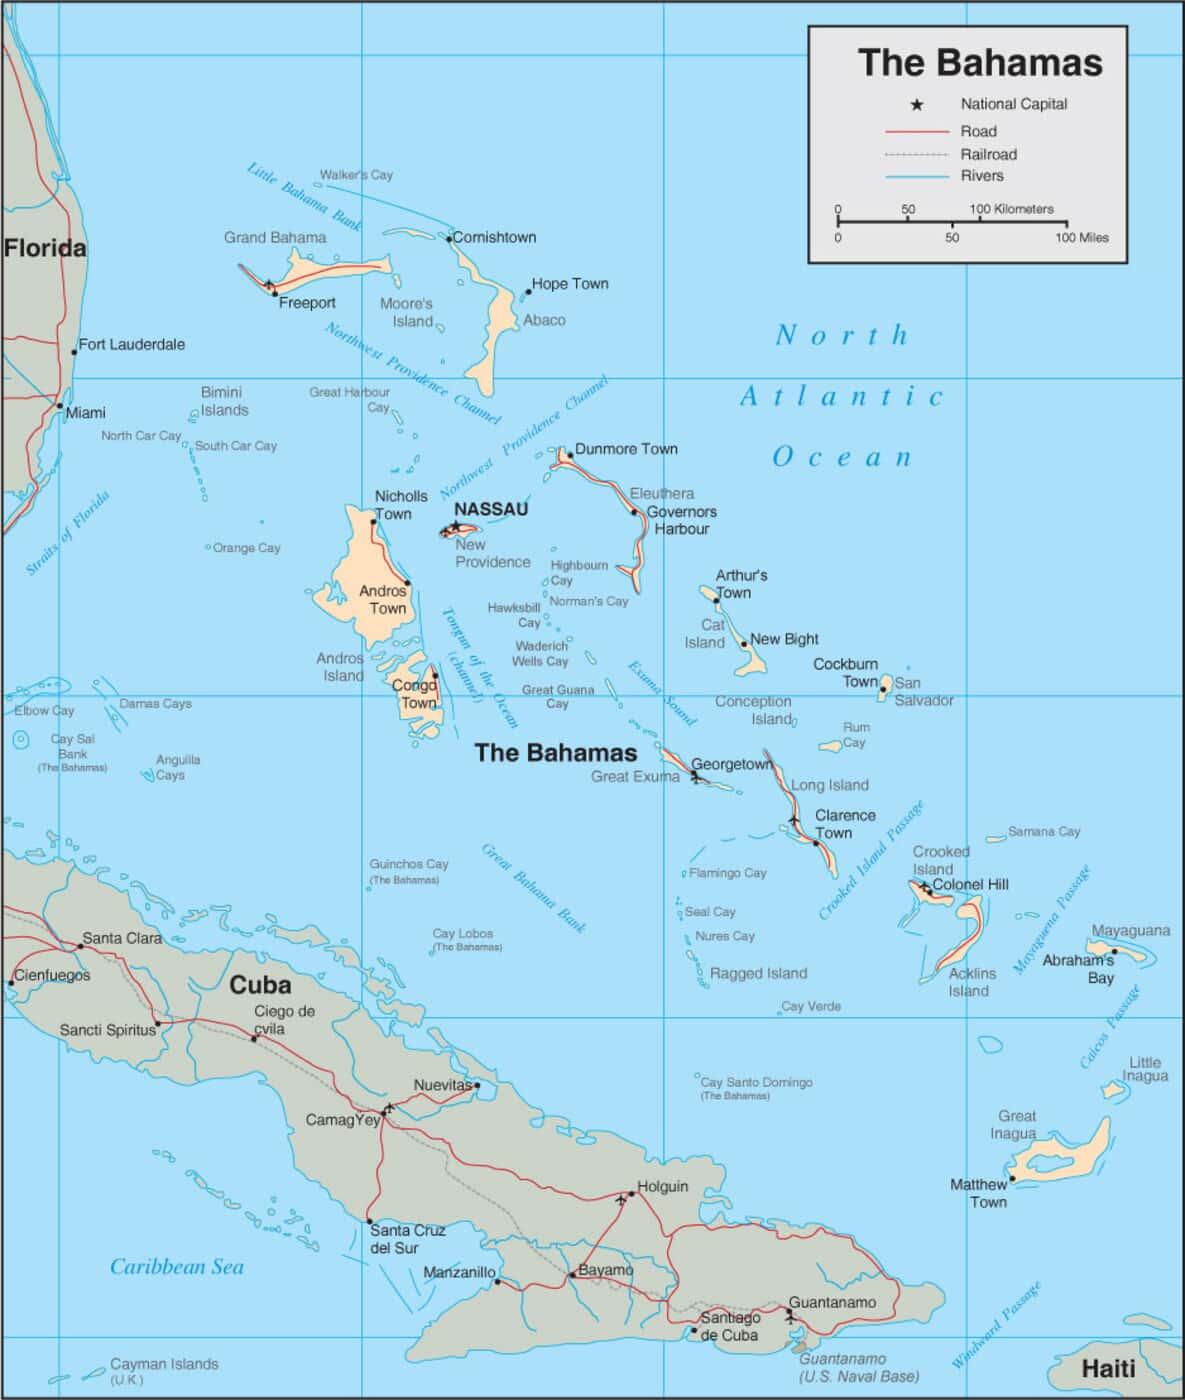 Bahamas Map - Detailed Map of The Bahamas